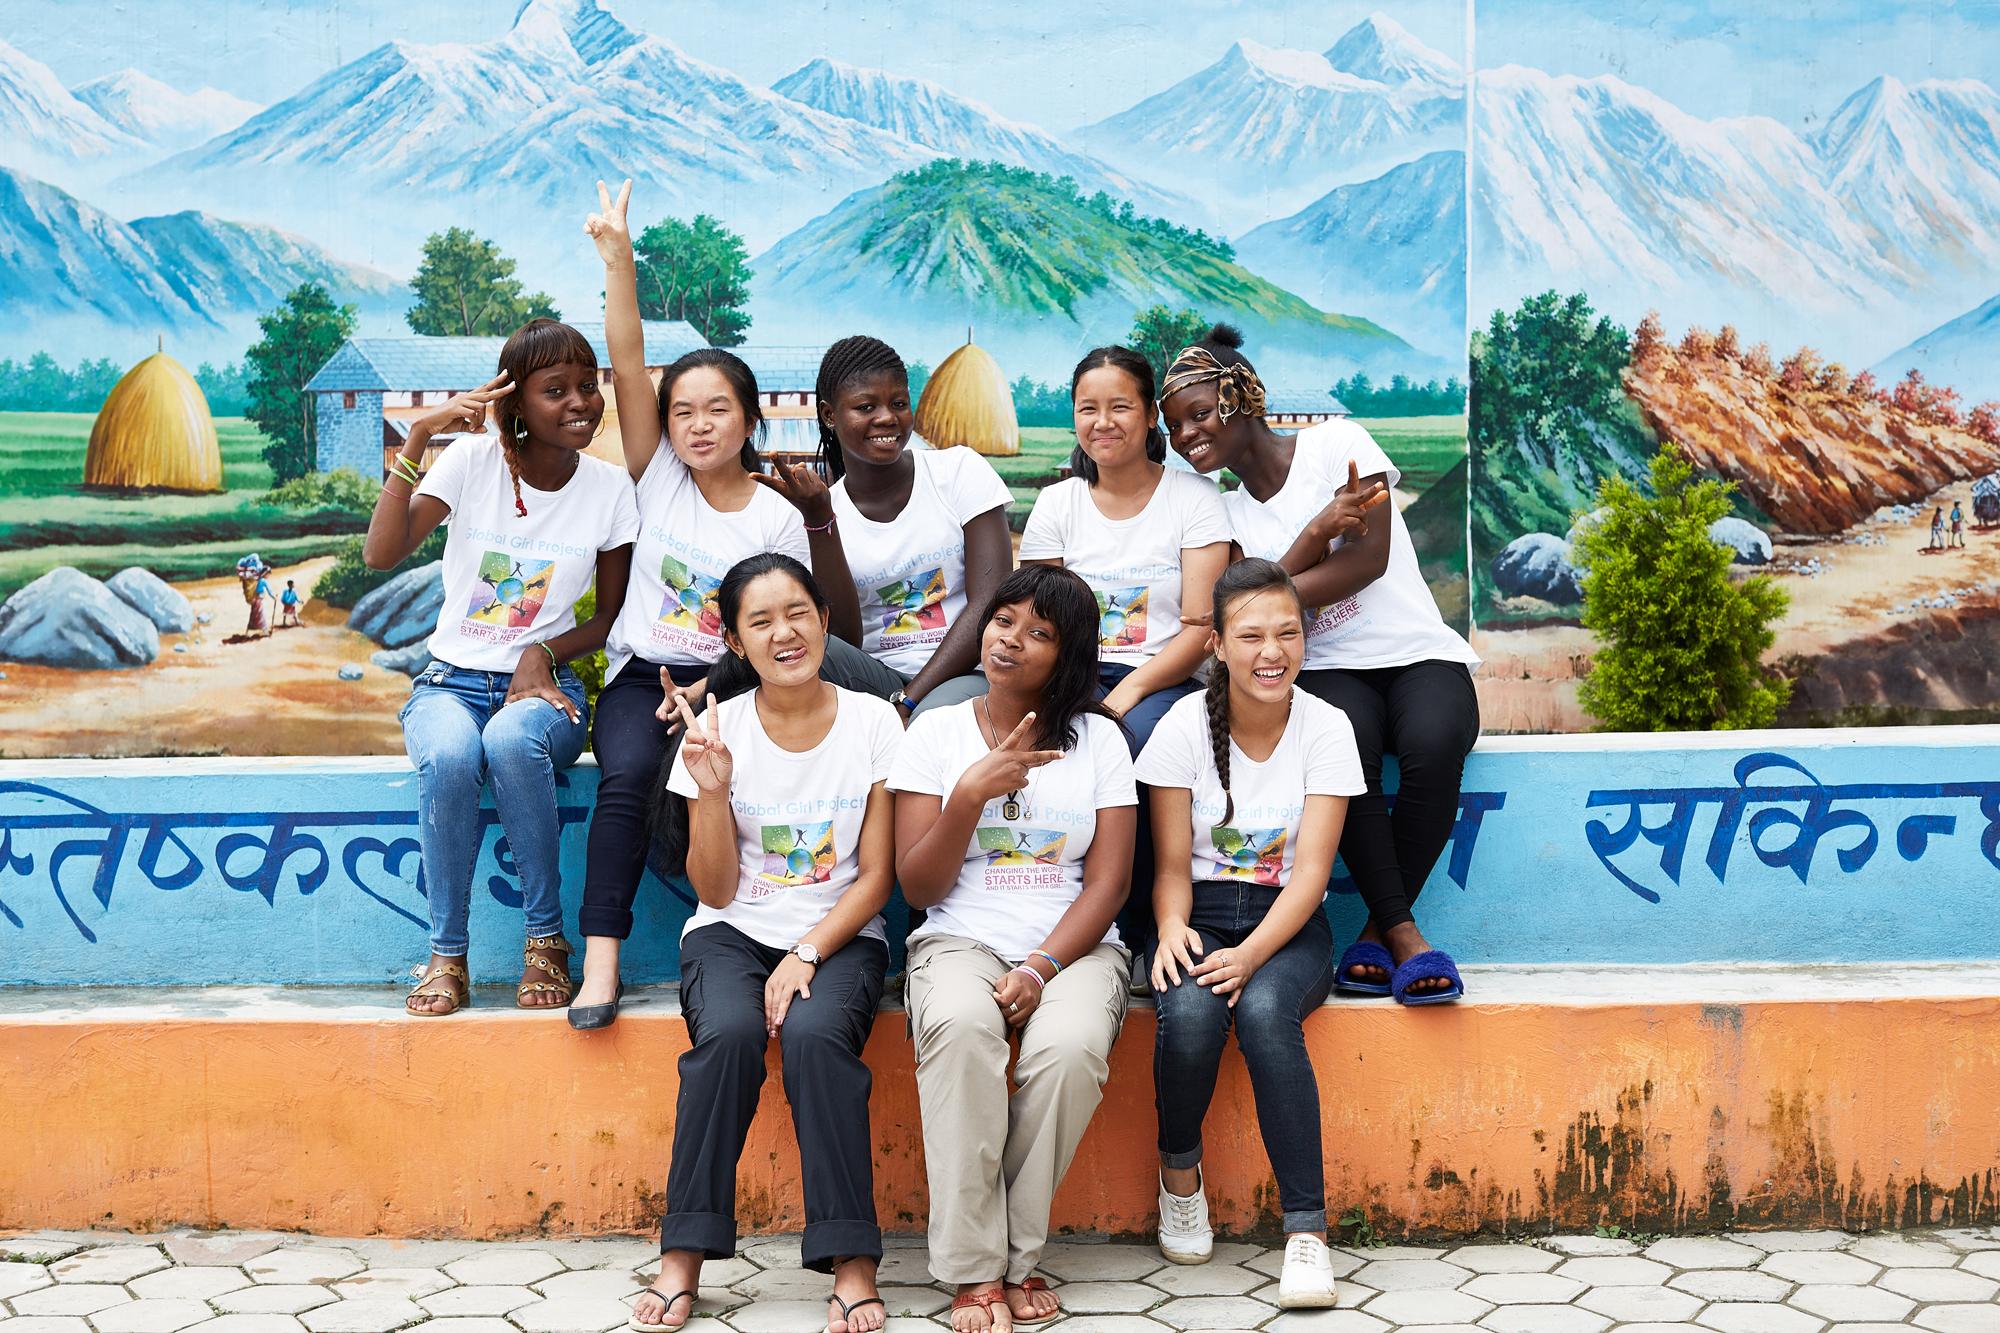 Our 2018 scholars in Kathmandu, Nepal!!